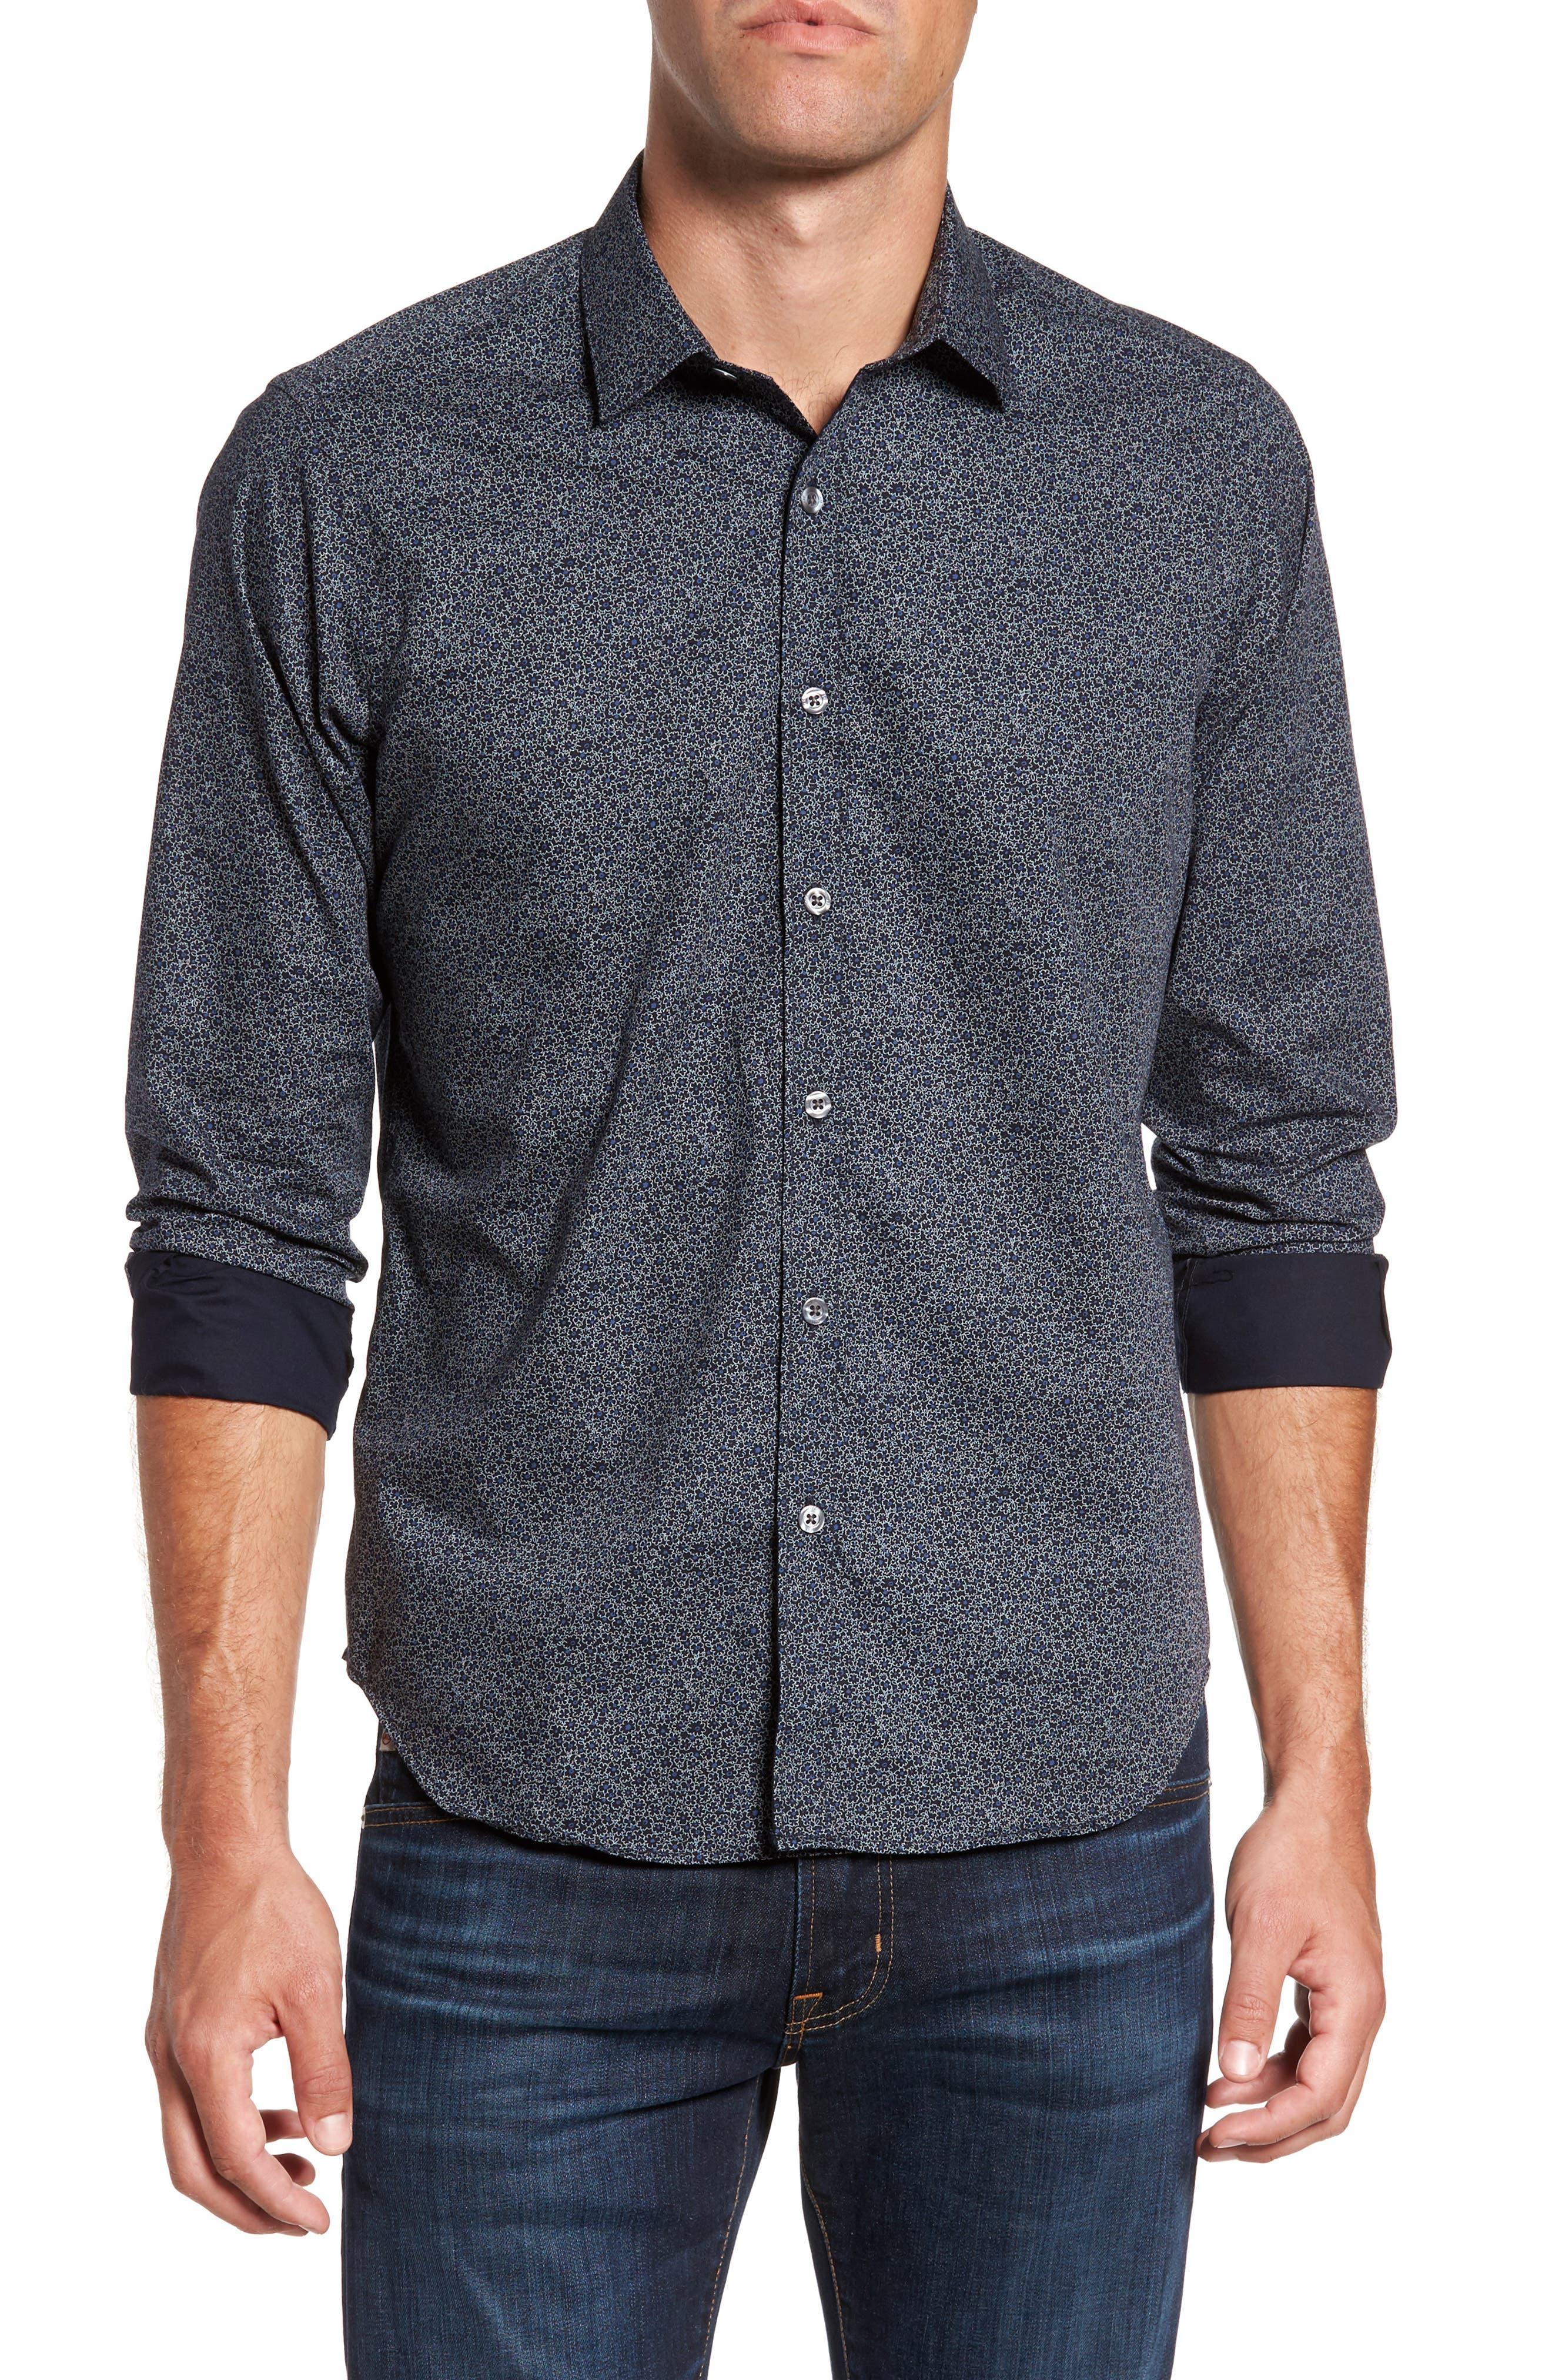 Jackson Slim Fit Floral Print Sport Shirt,                         Main,                         color, Black